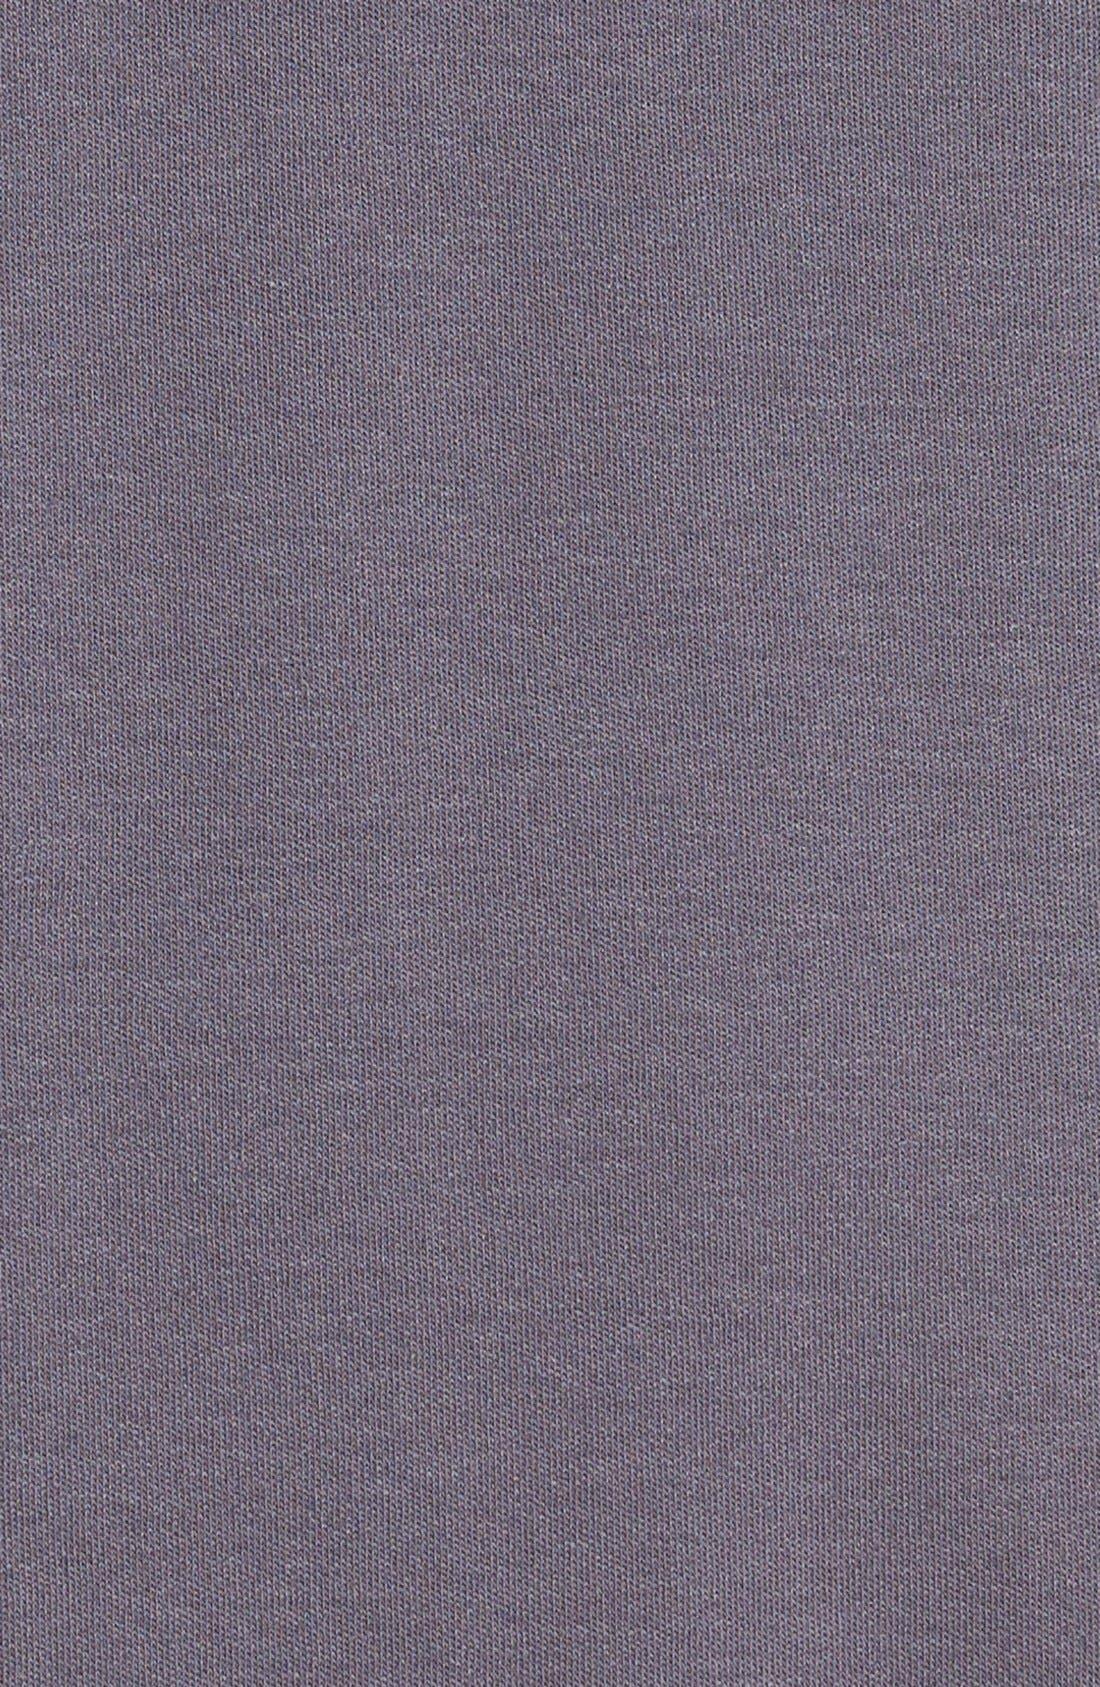 Regular Fit Interlock Knit Polo,                             Alternate thumbnail 2, color,                             GREY STONEHENGE